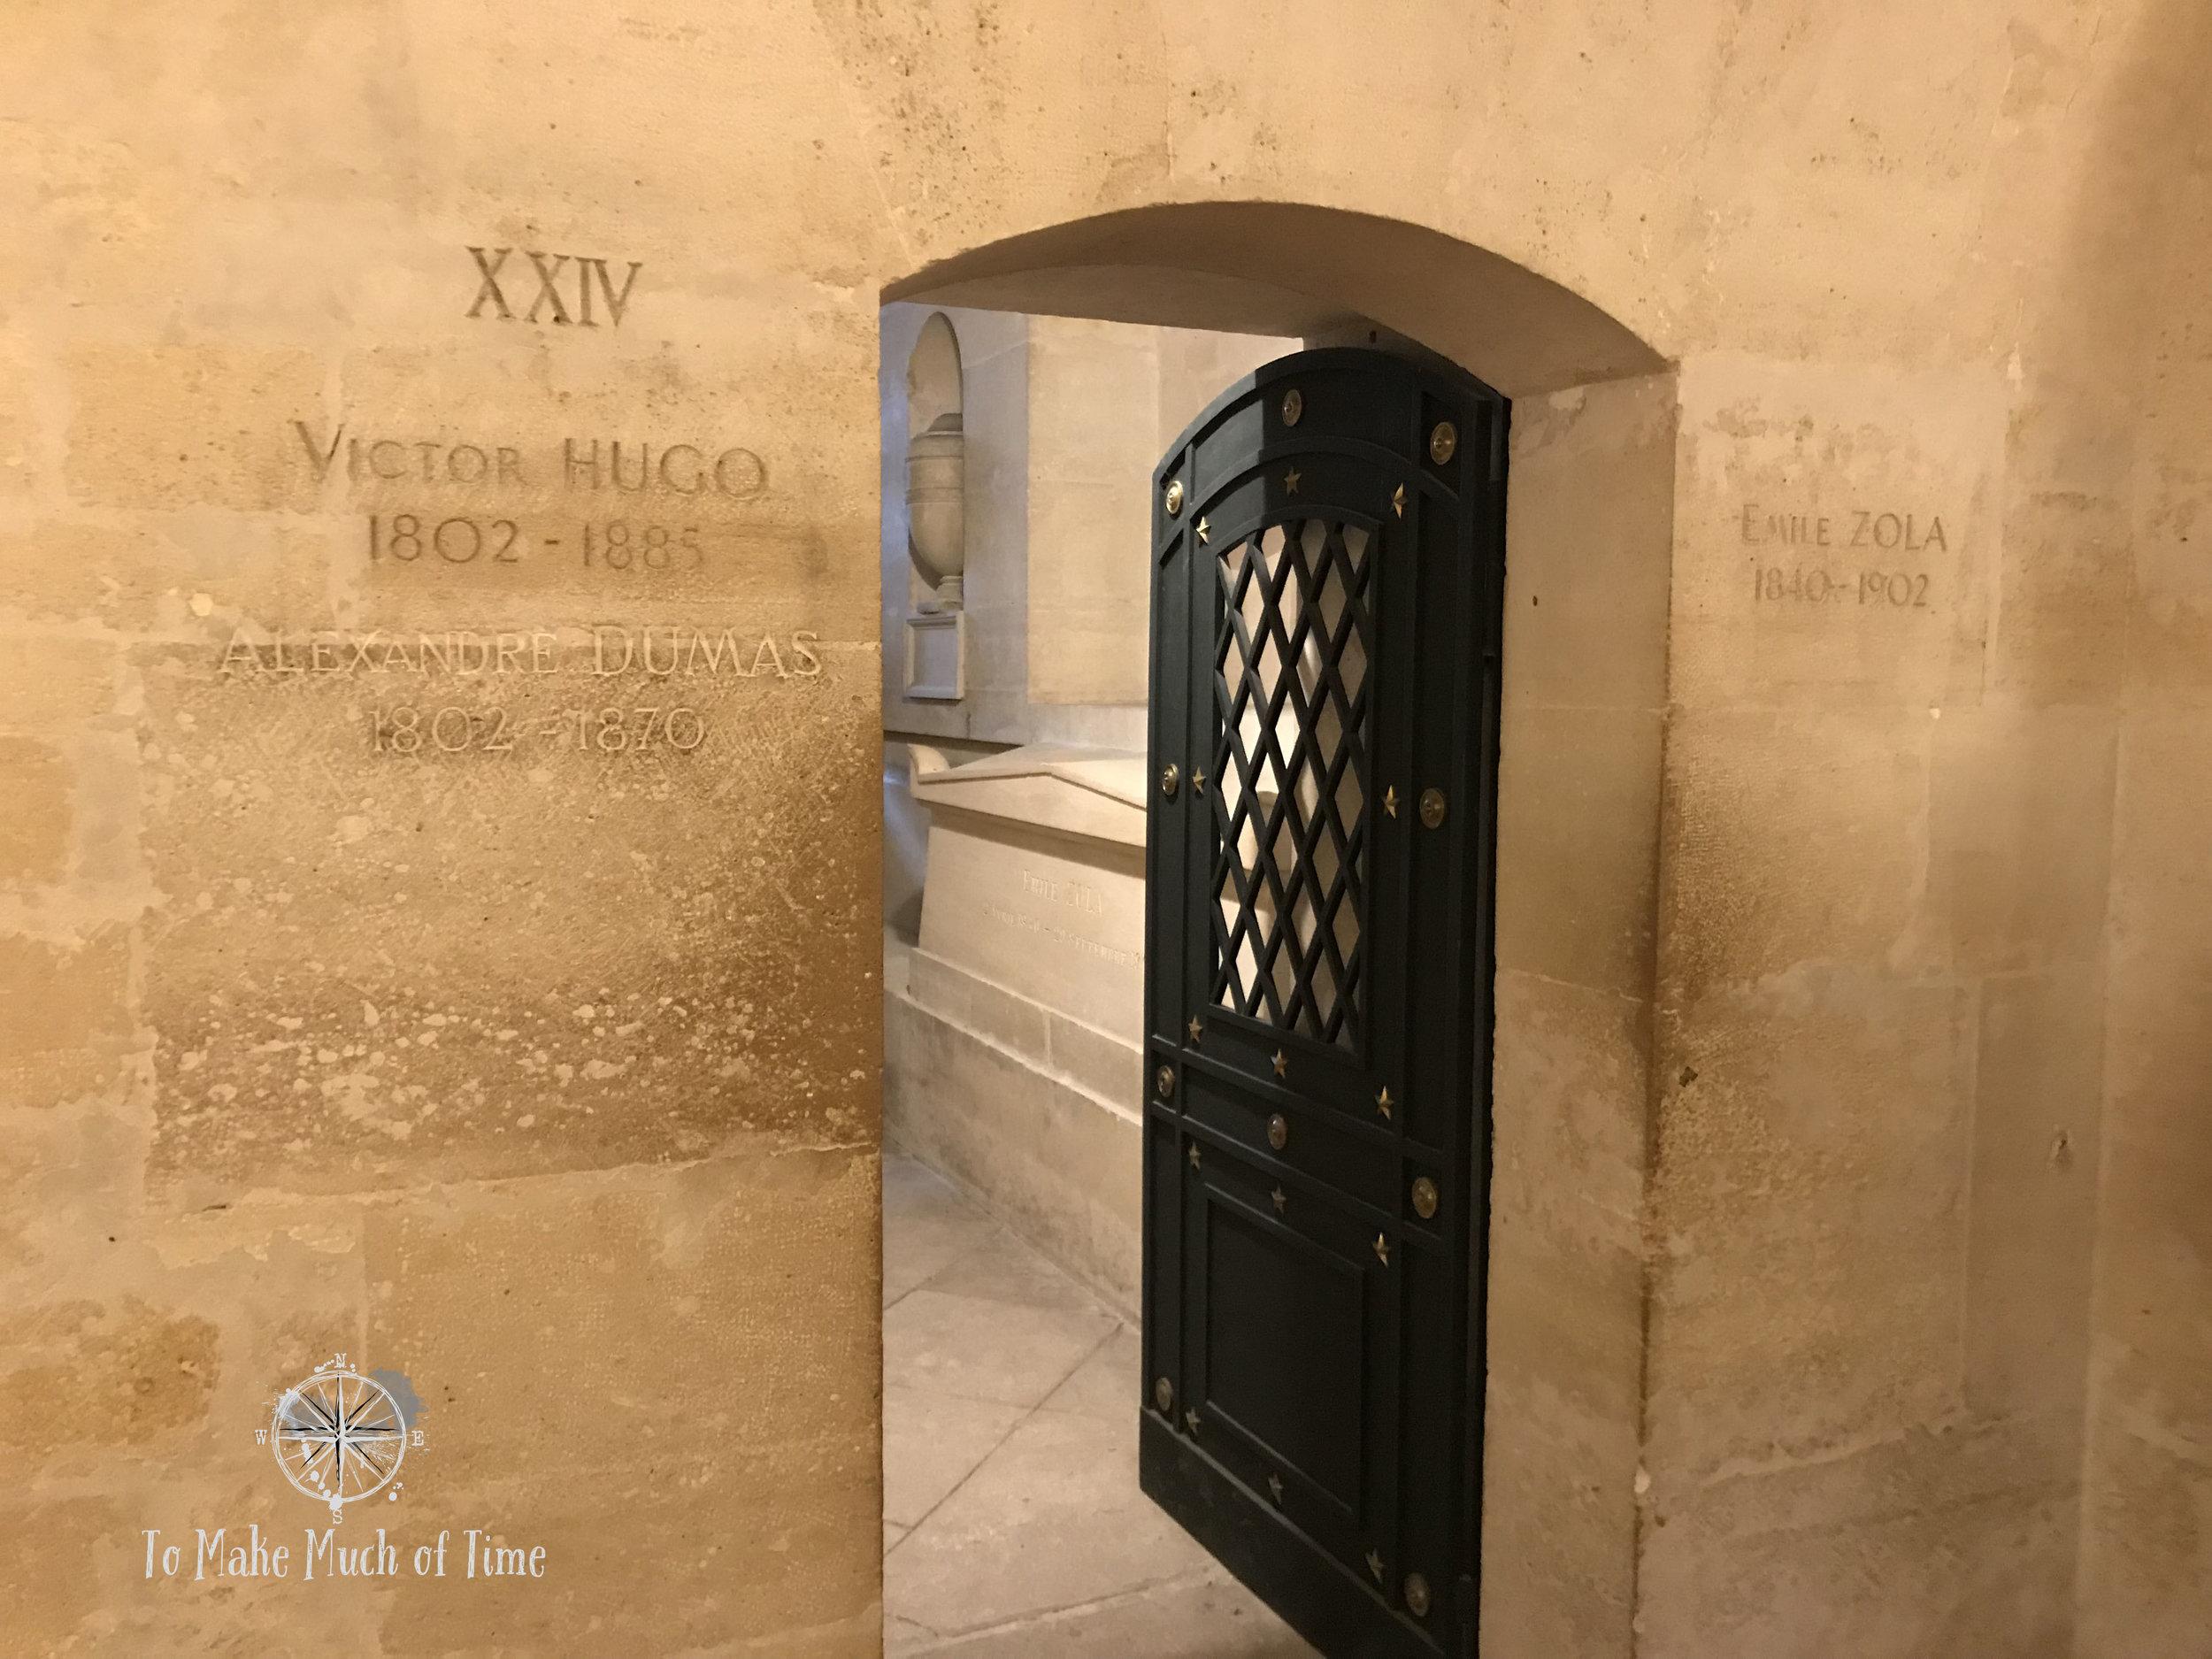 Victor Hugo, Alexandre Dumas, and Emile Zola share a room below Paris' Pantheon.